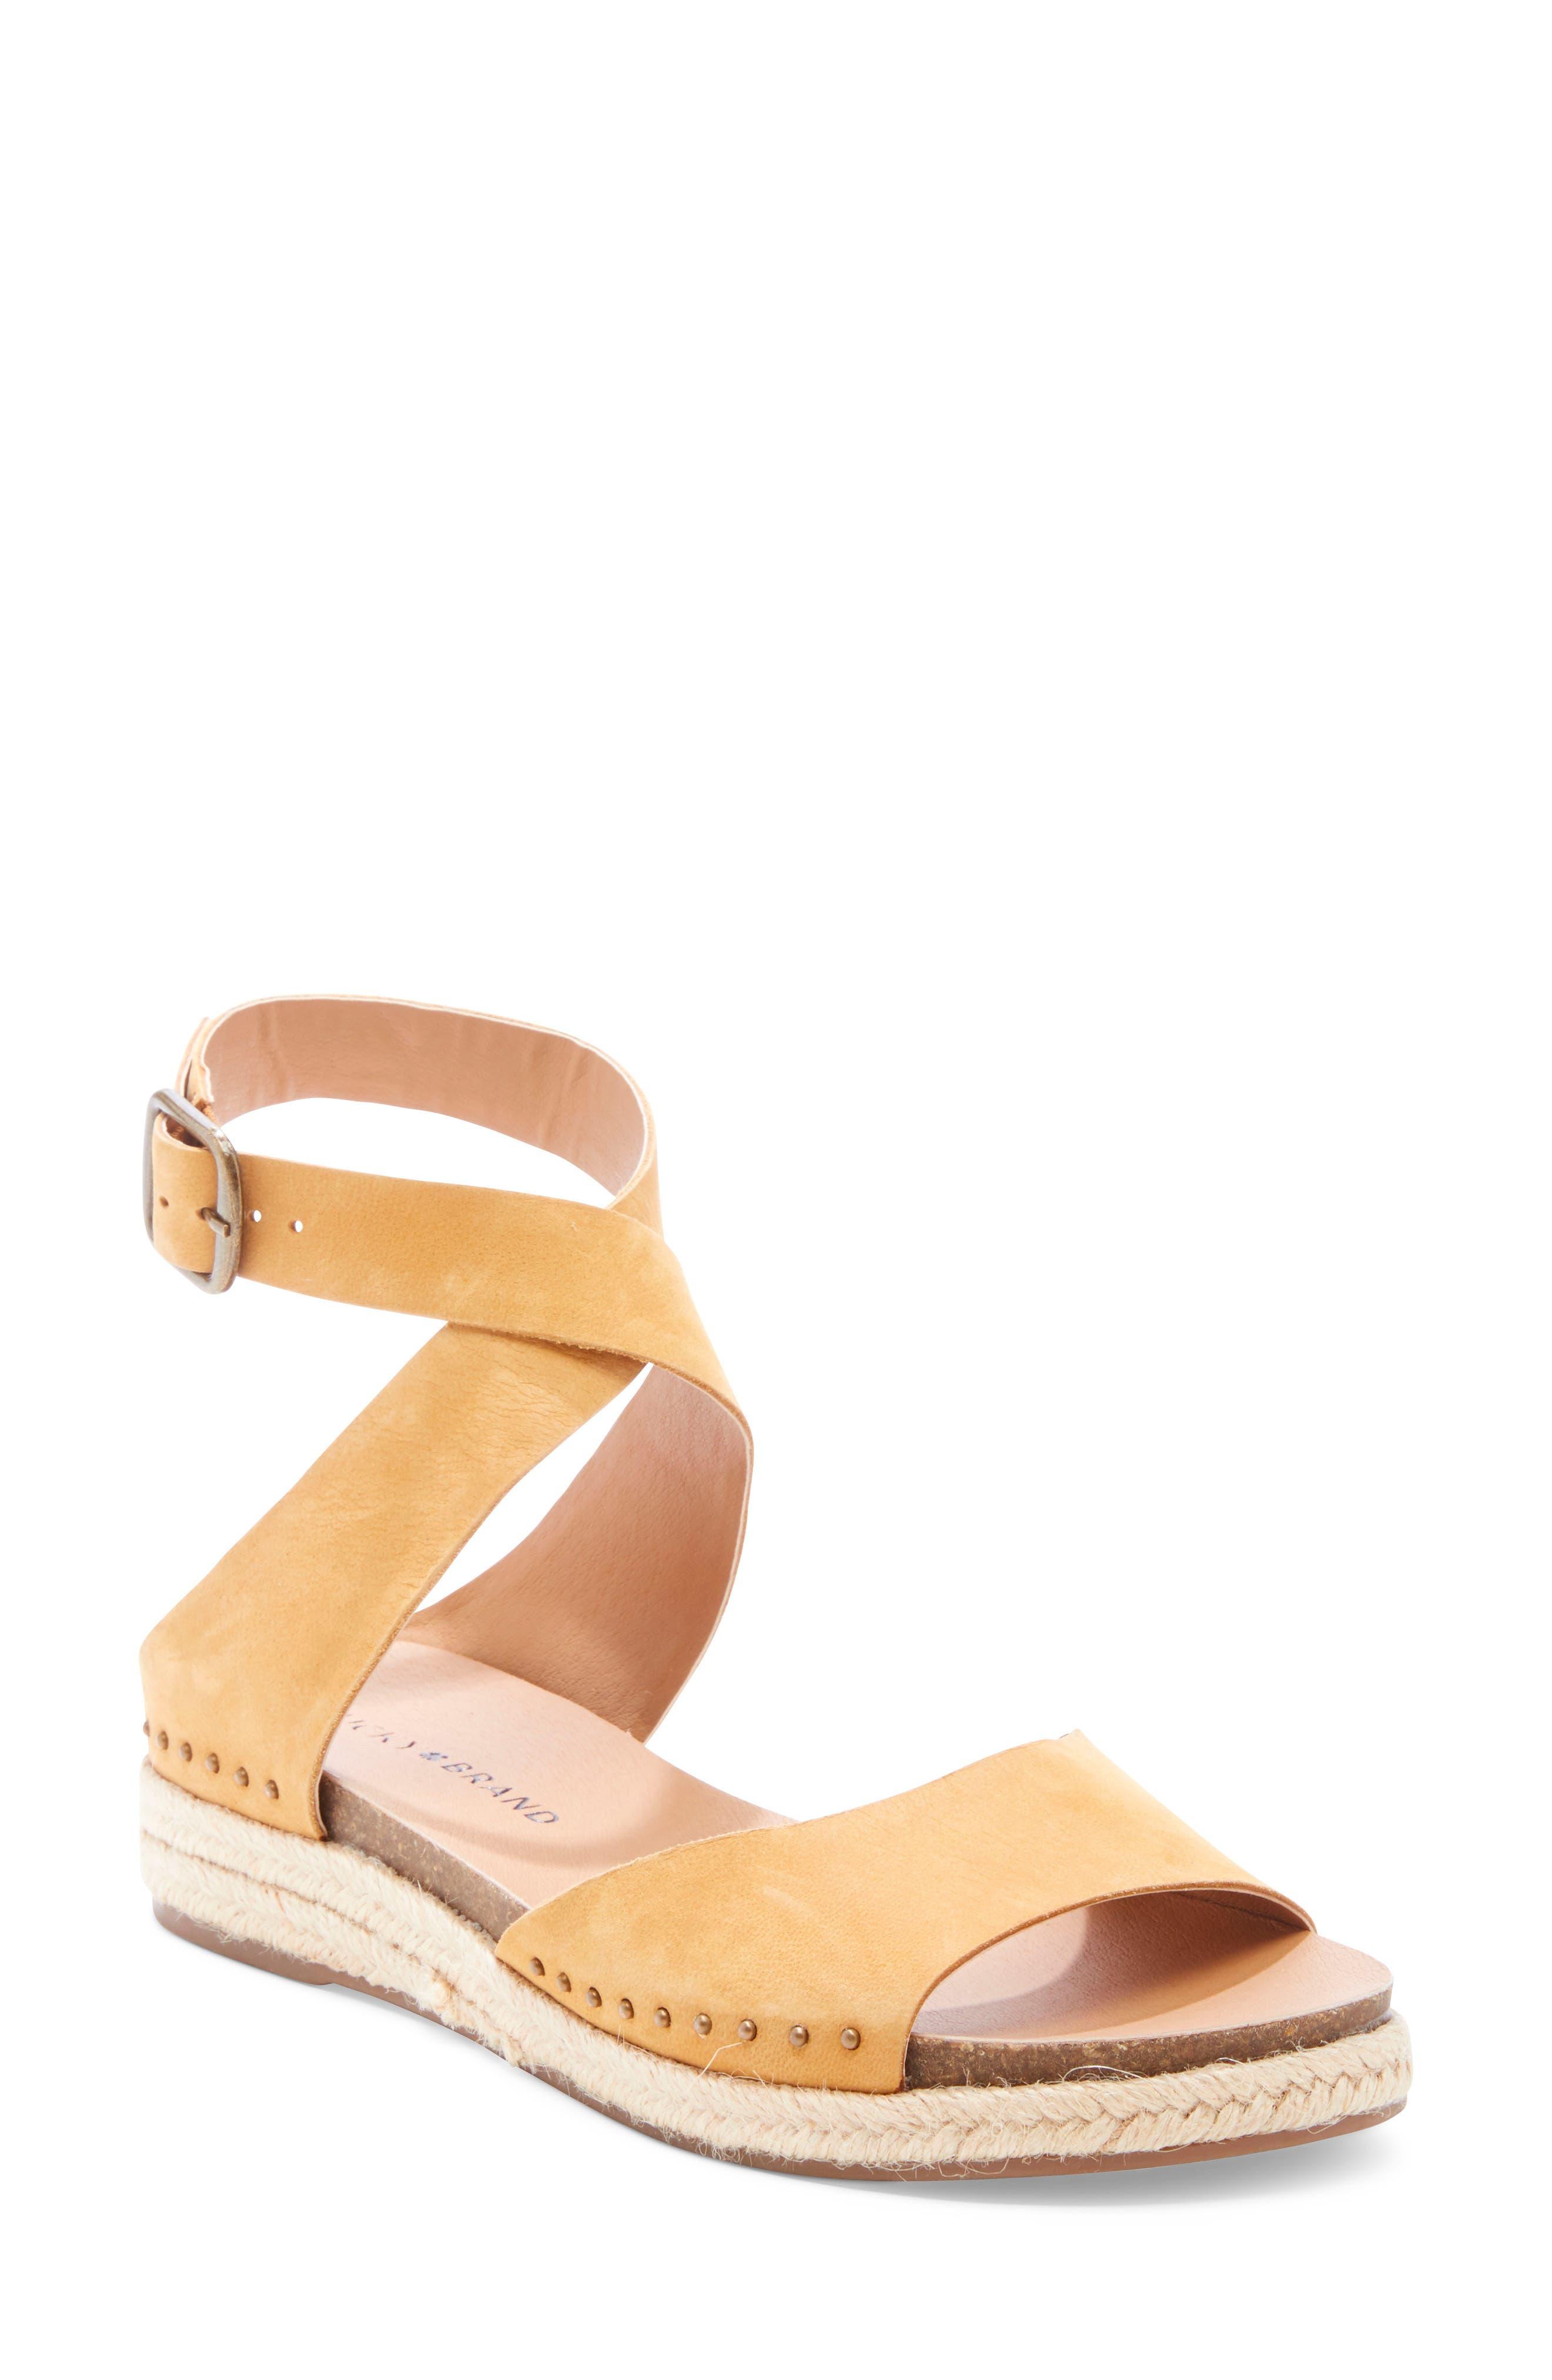 Lucky Brand Gladas Wedge Espadrille Sandal, Brown